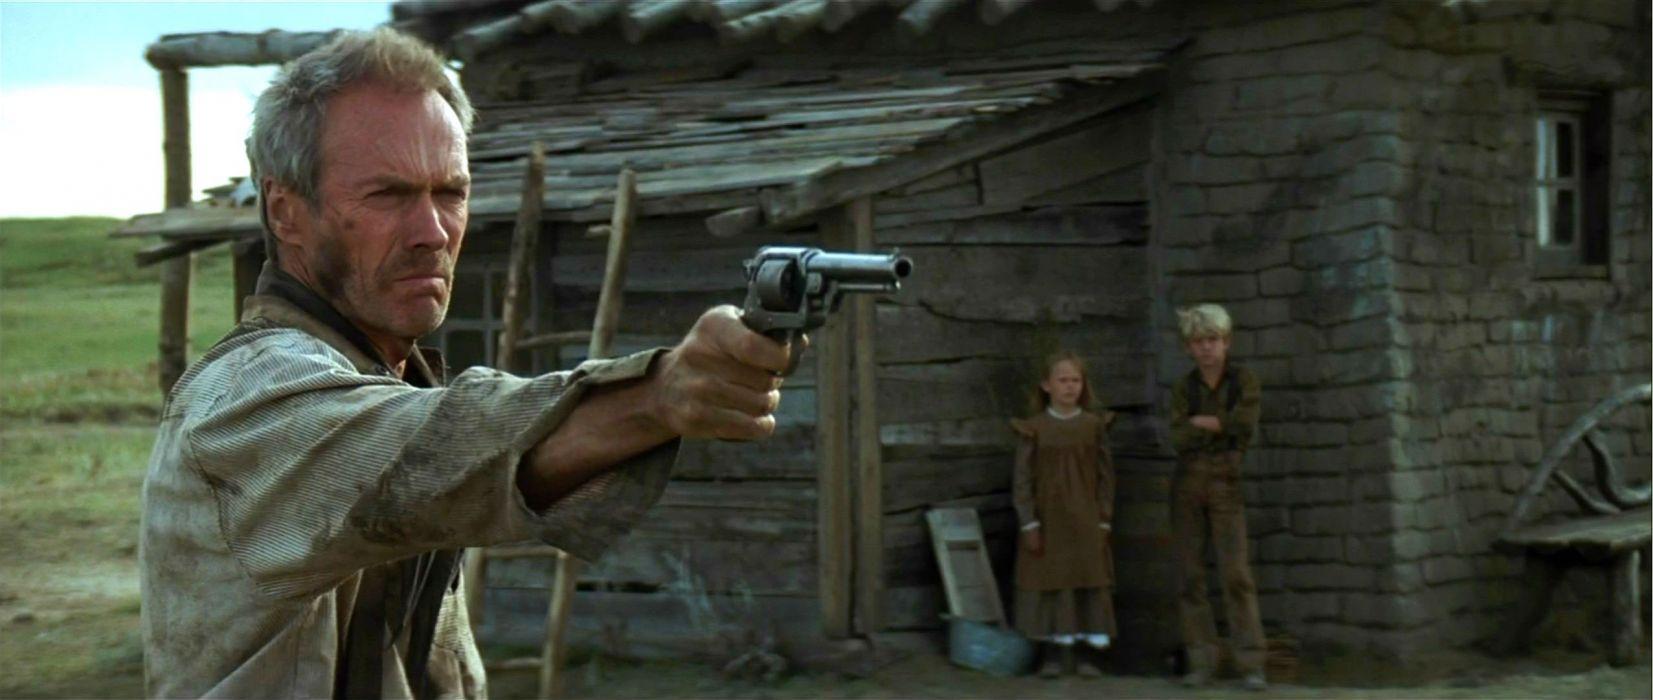 UNFORGIVEN western clint eastwood drama (22) wallpaper